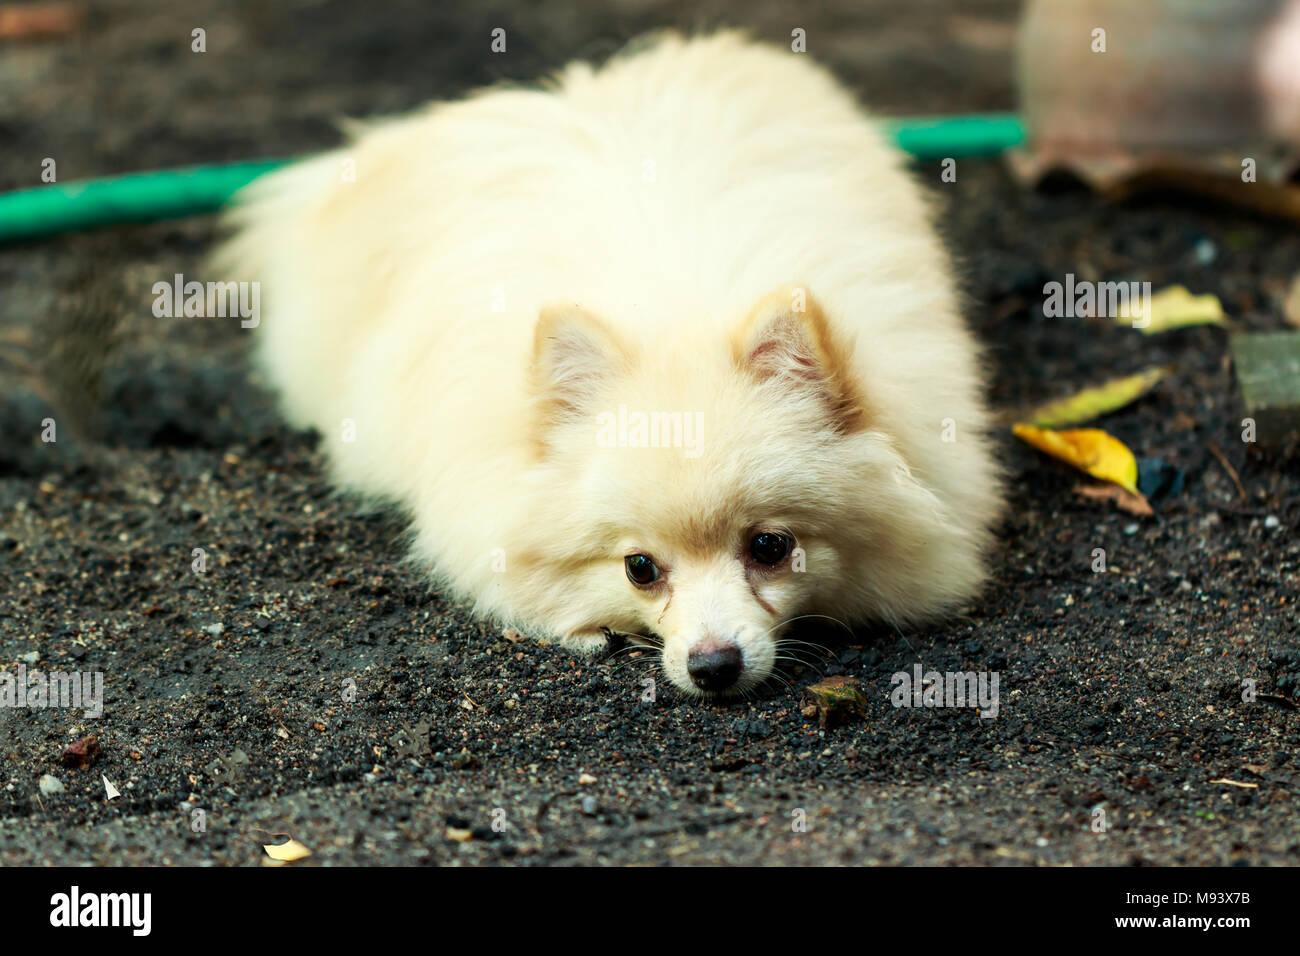 White Brown Pomeranian Puppy Dog Stock Photo 177722031 Alamy